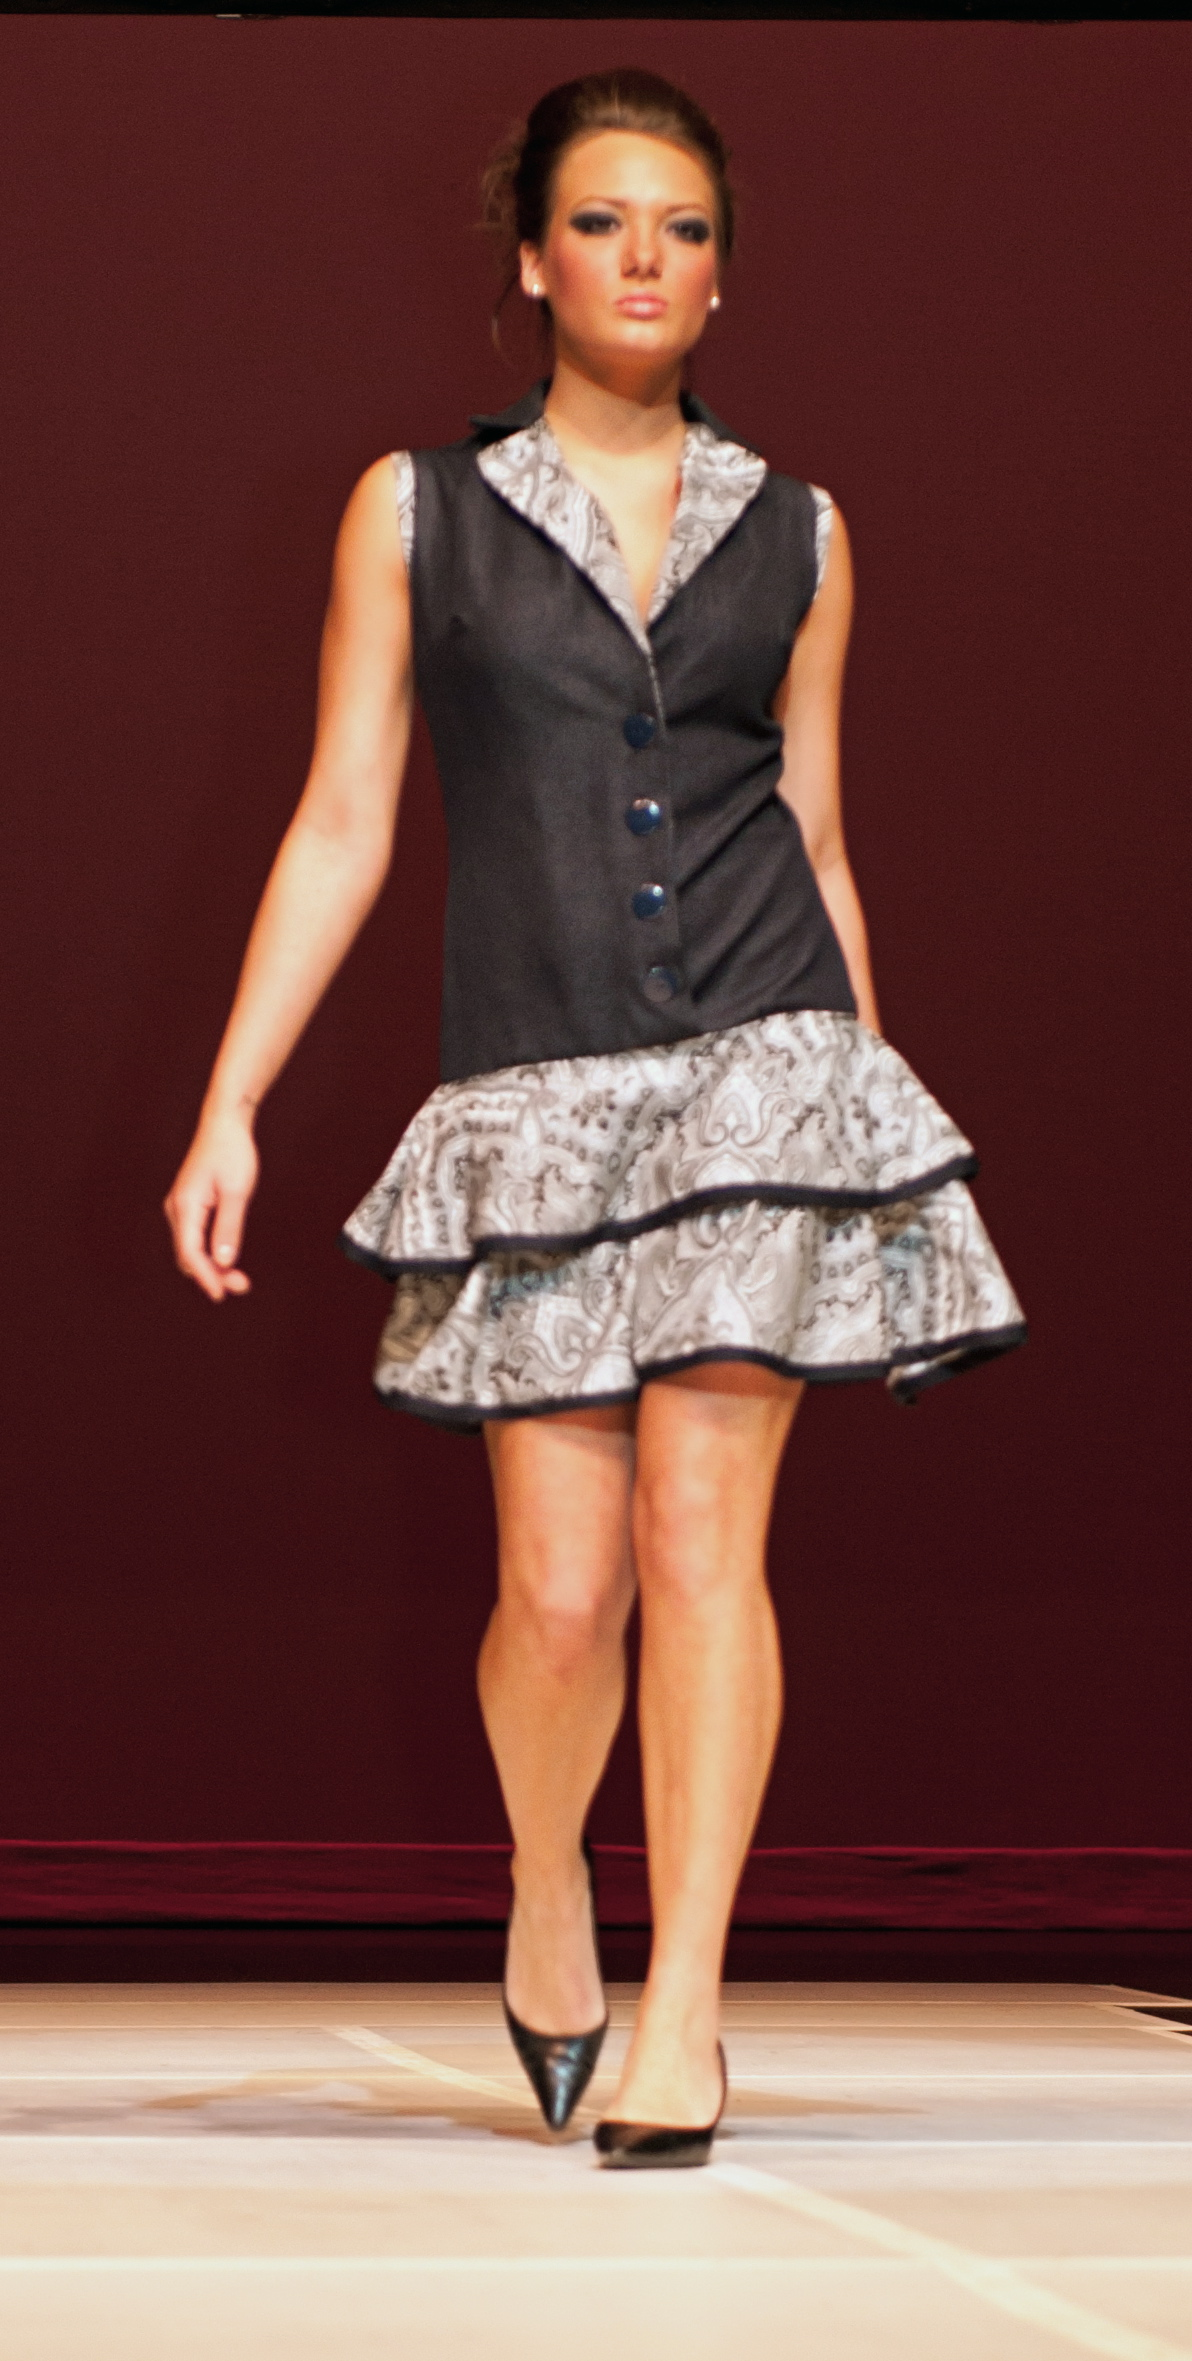 Denim dress showcased at school fashion show